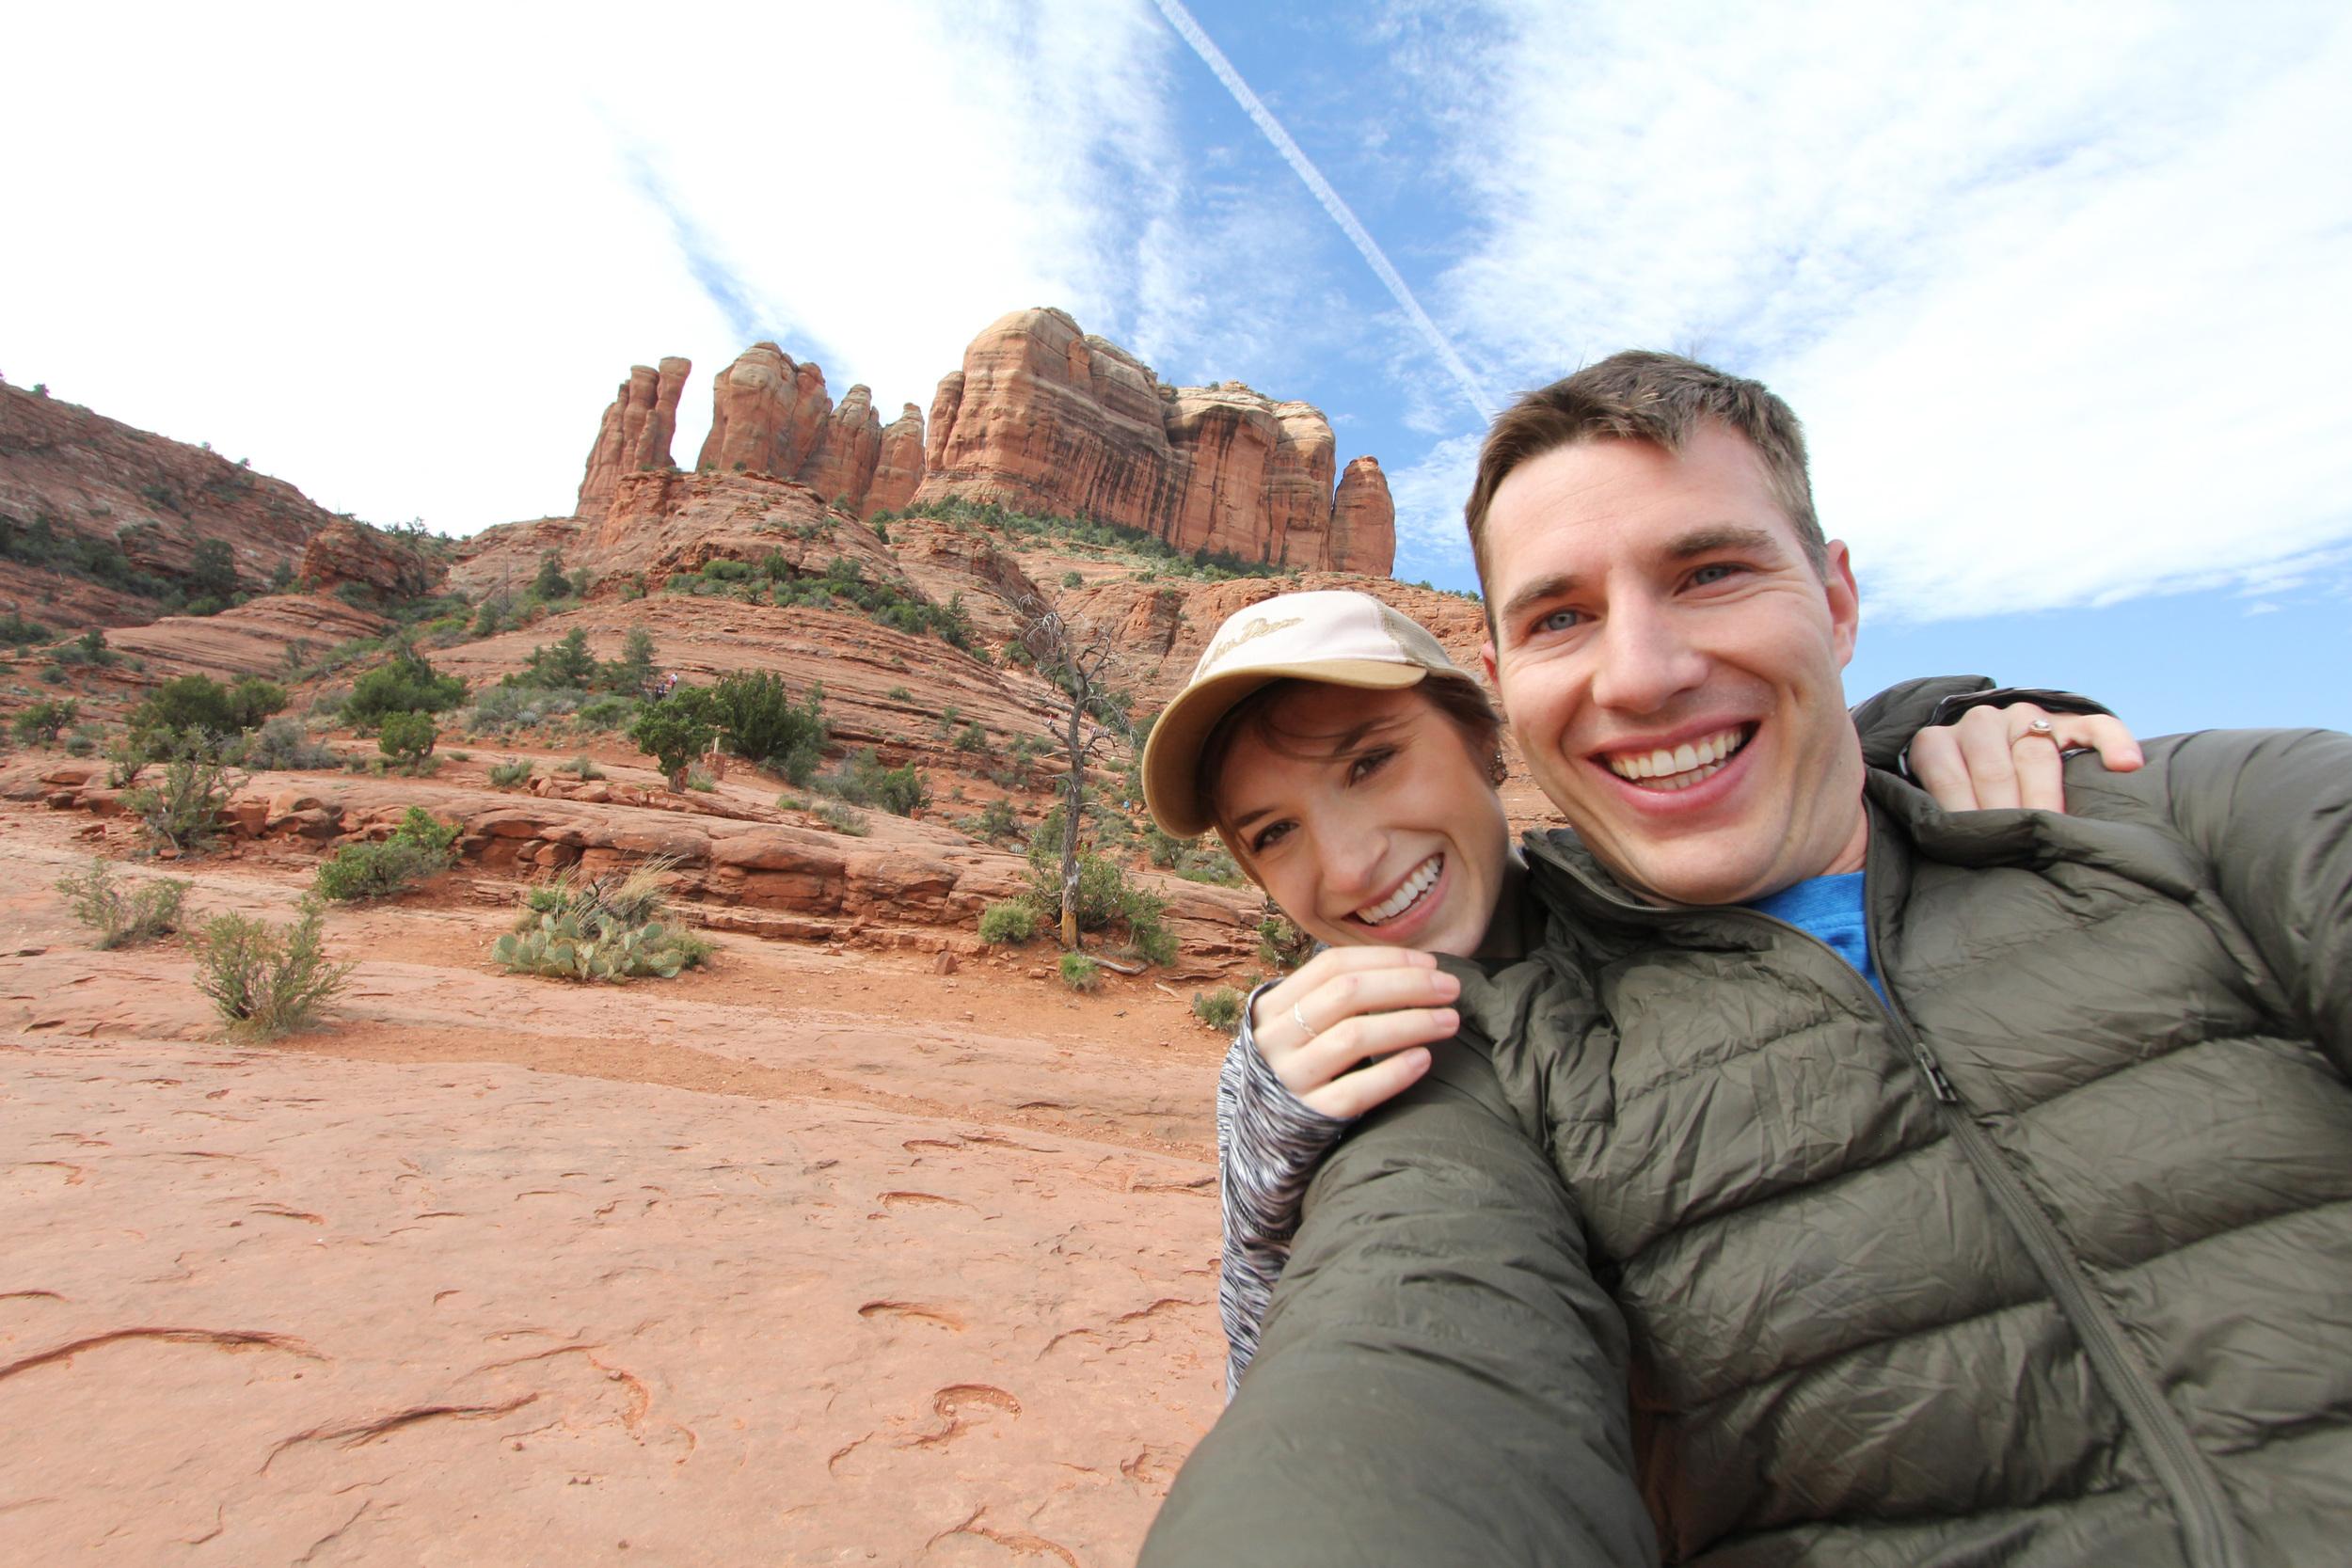 Honeymoon_Tuesday_Sedona_Arizona_JonCourvillePhotography-12.jpg